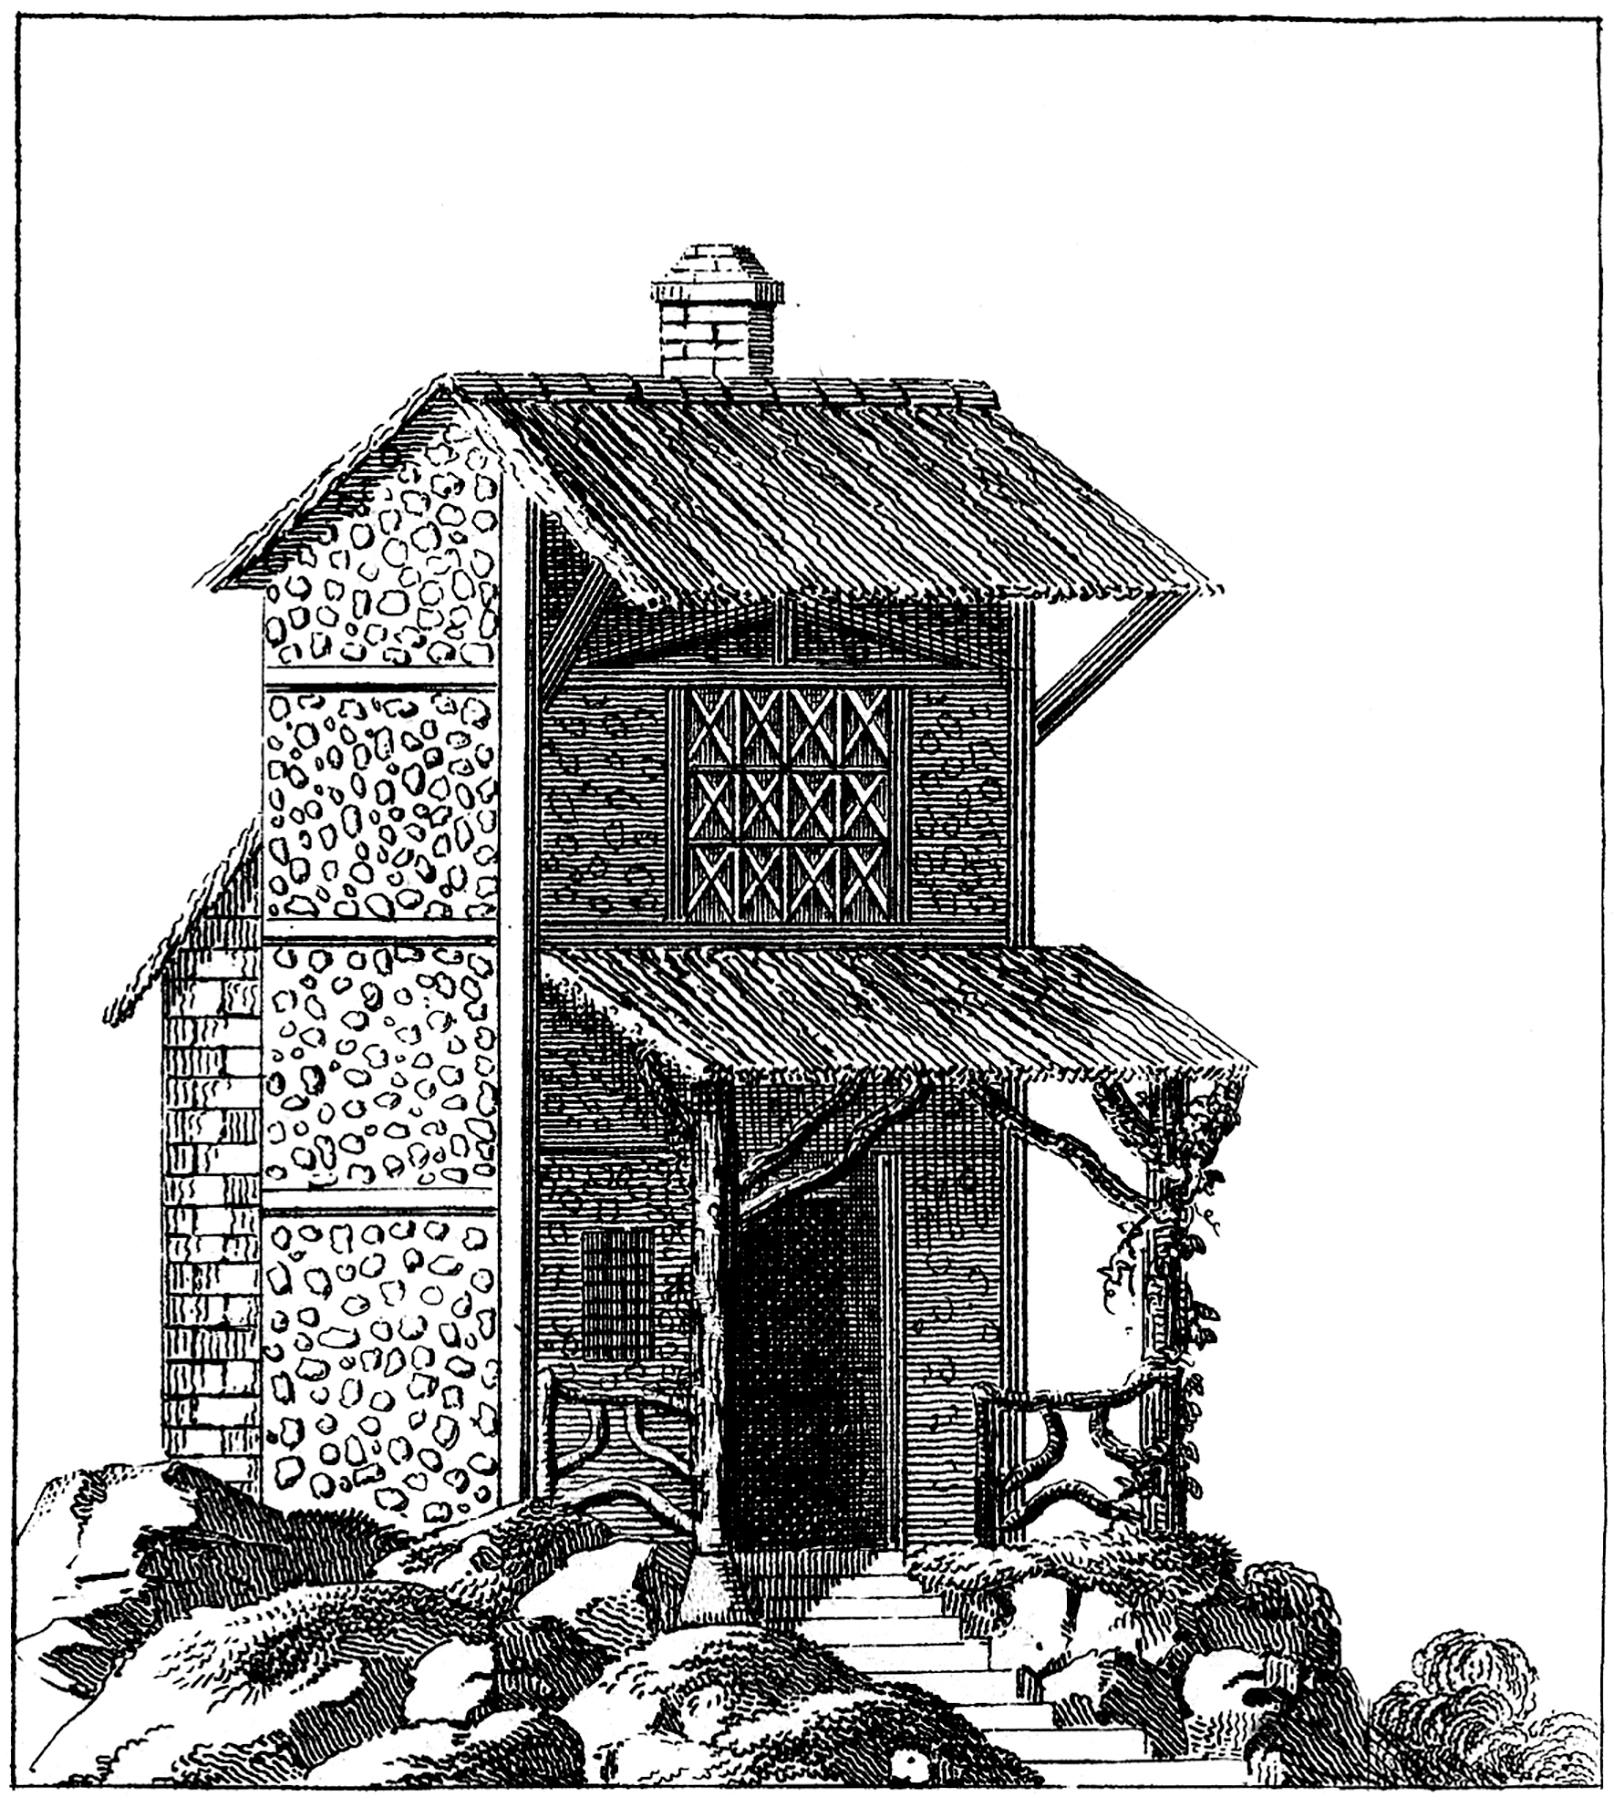 Vintage French Barn Image